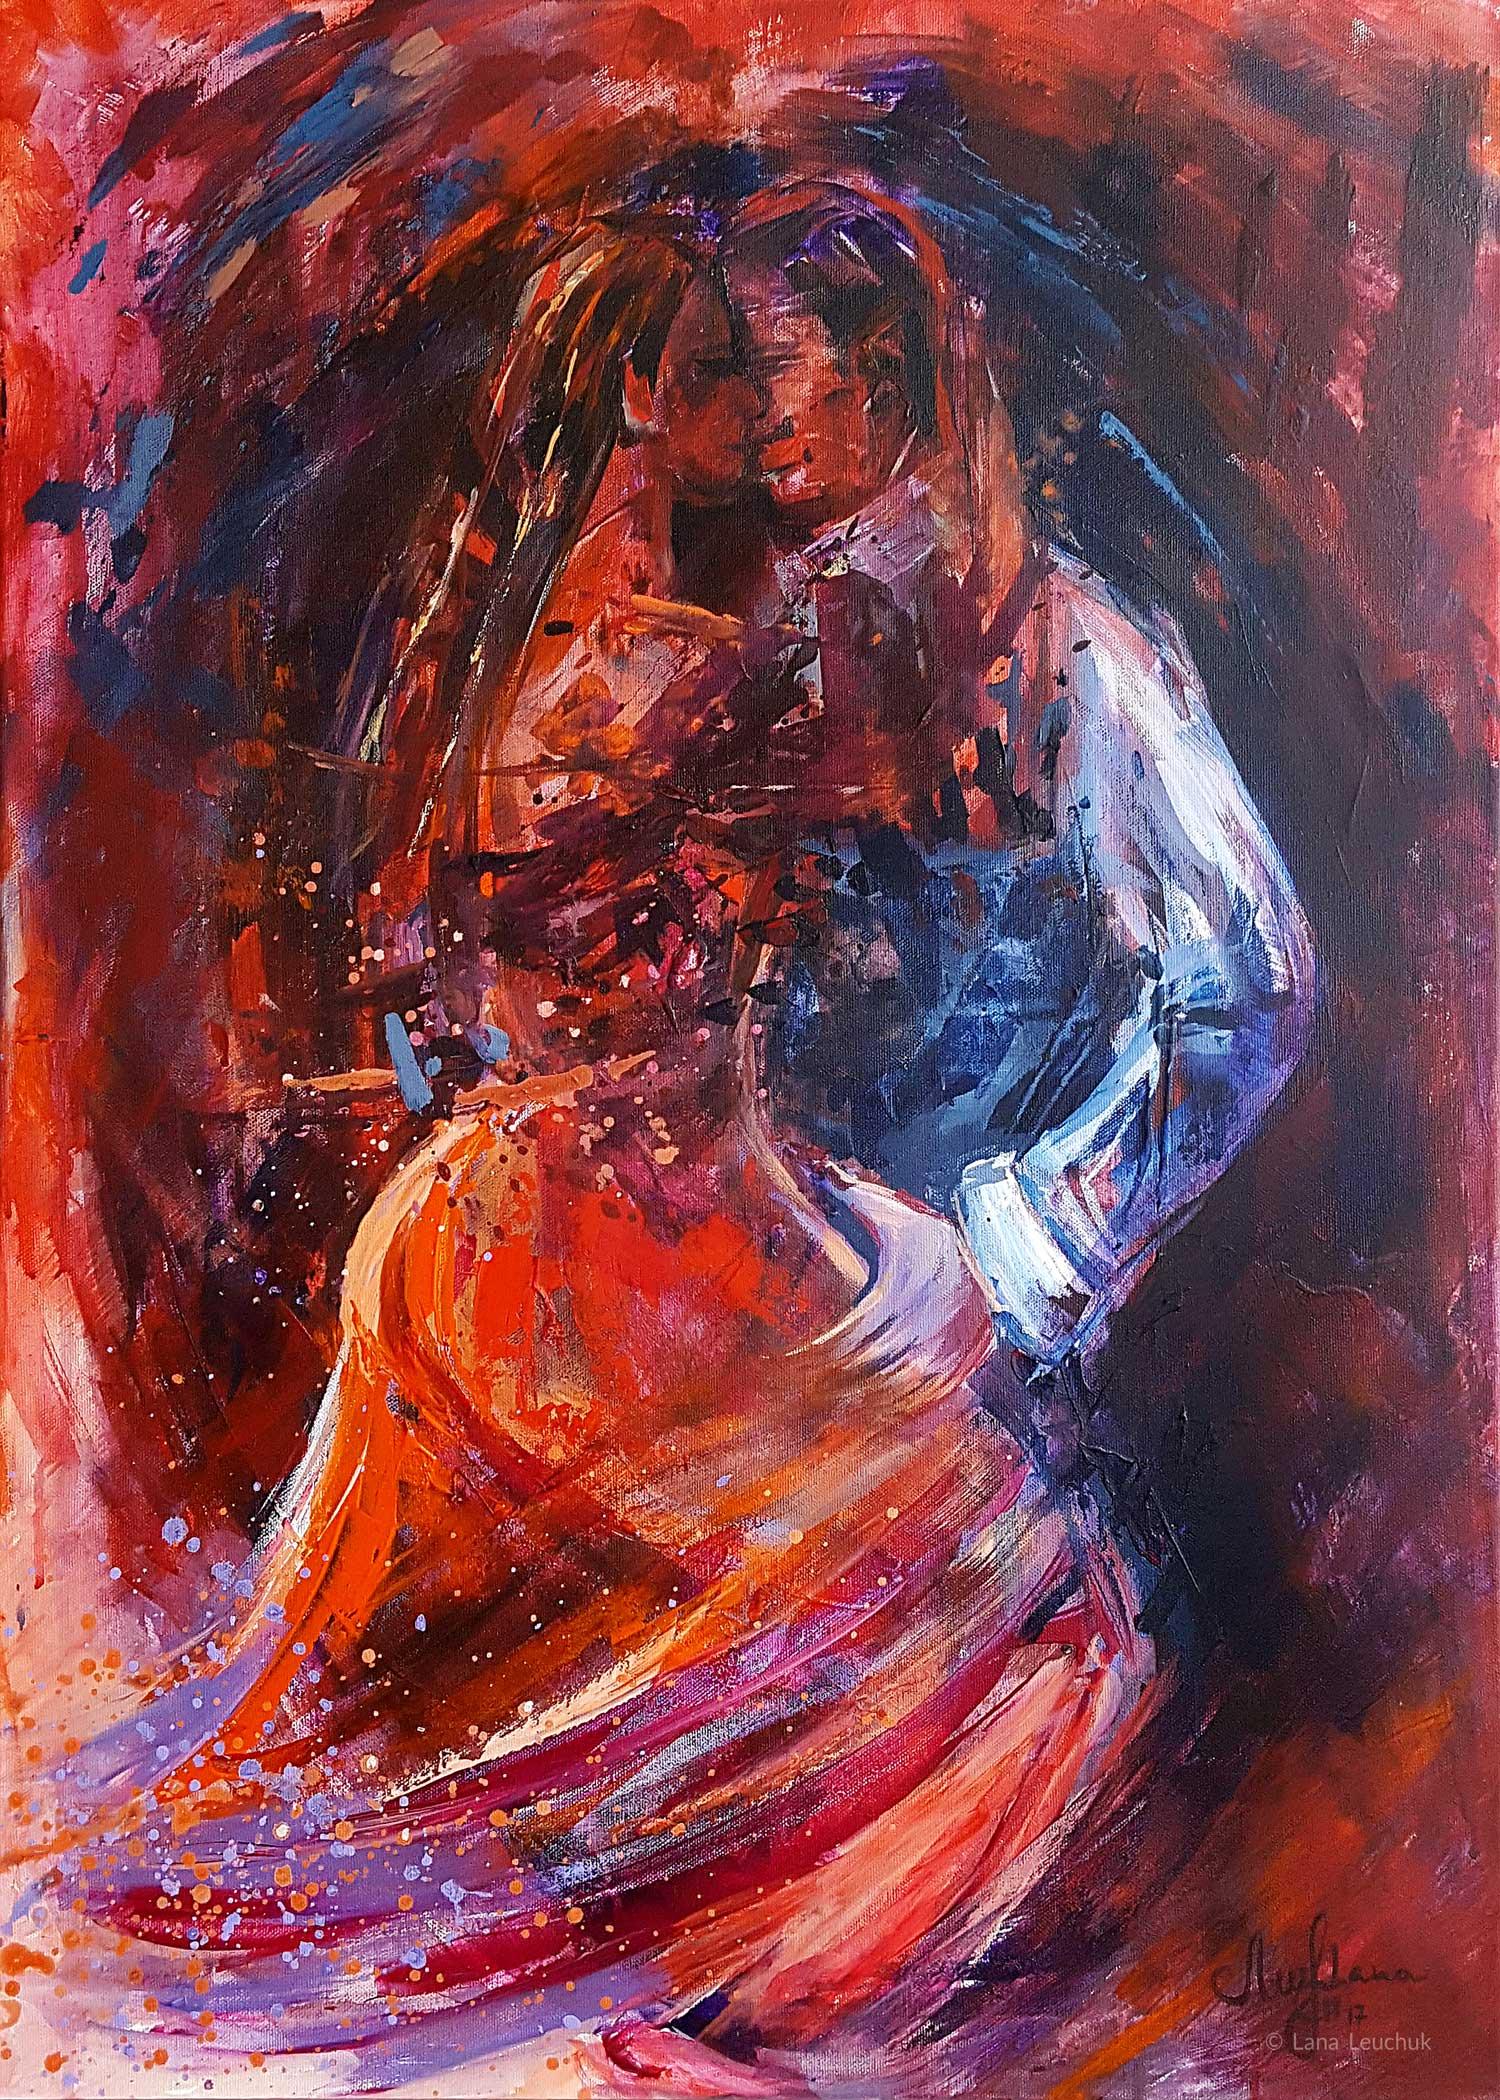 artwork-Life-is-a-Dance-acrylic-on-canvas-LANA-LEUCHUK-2017